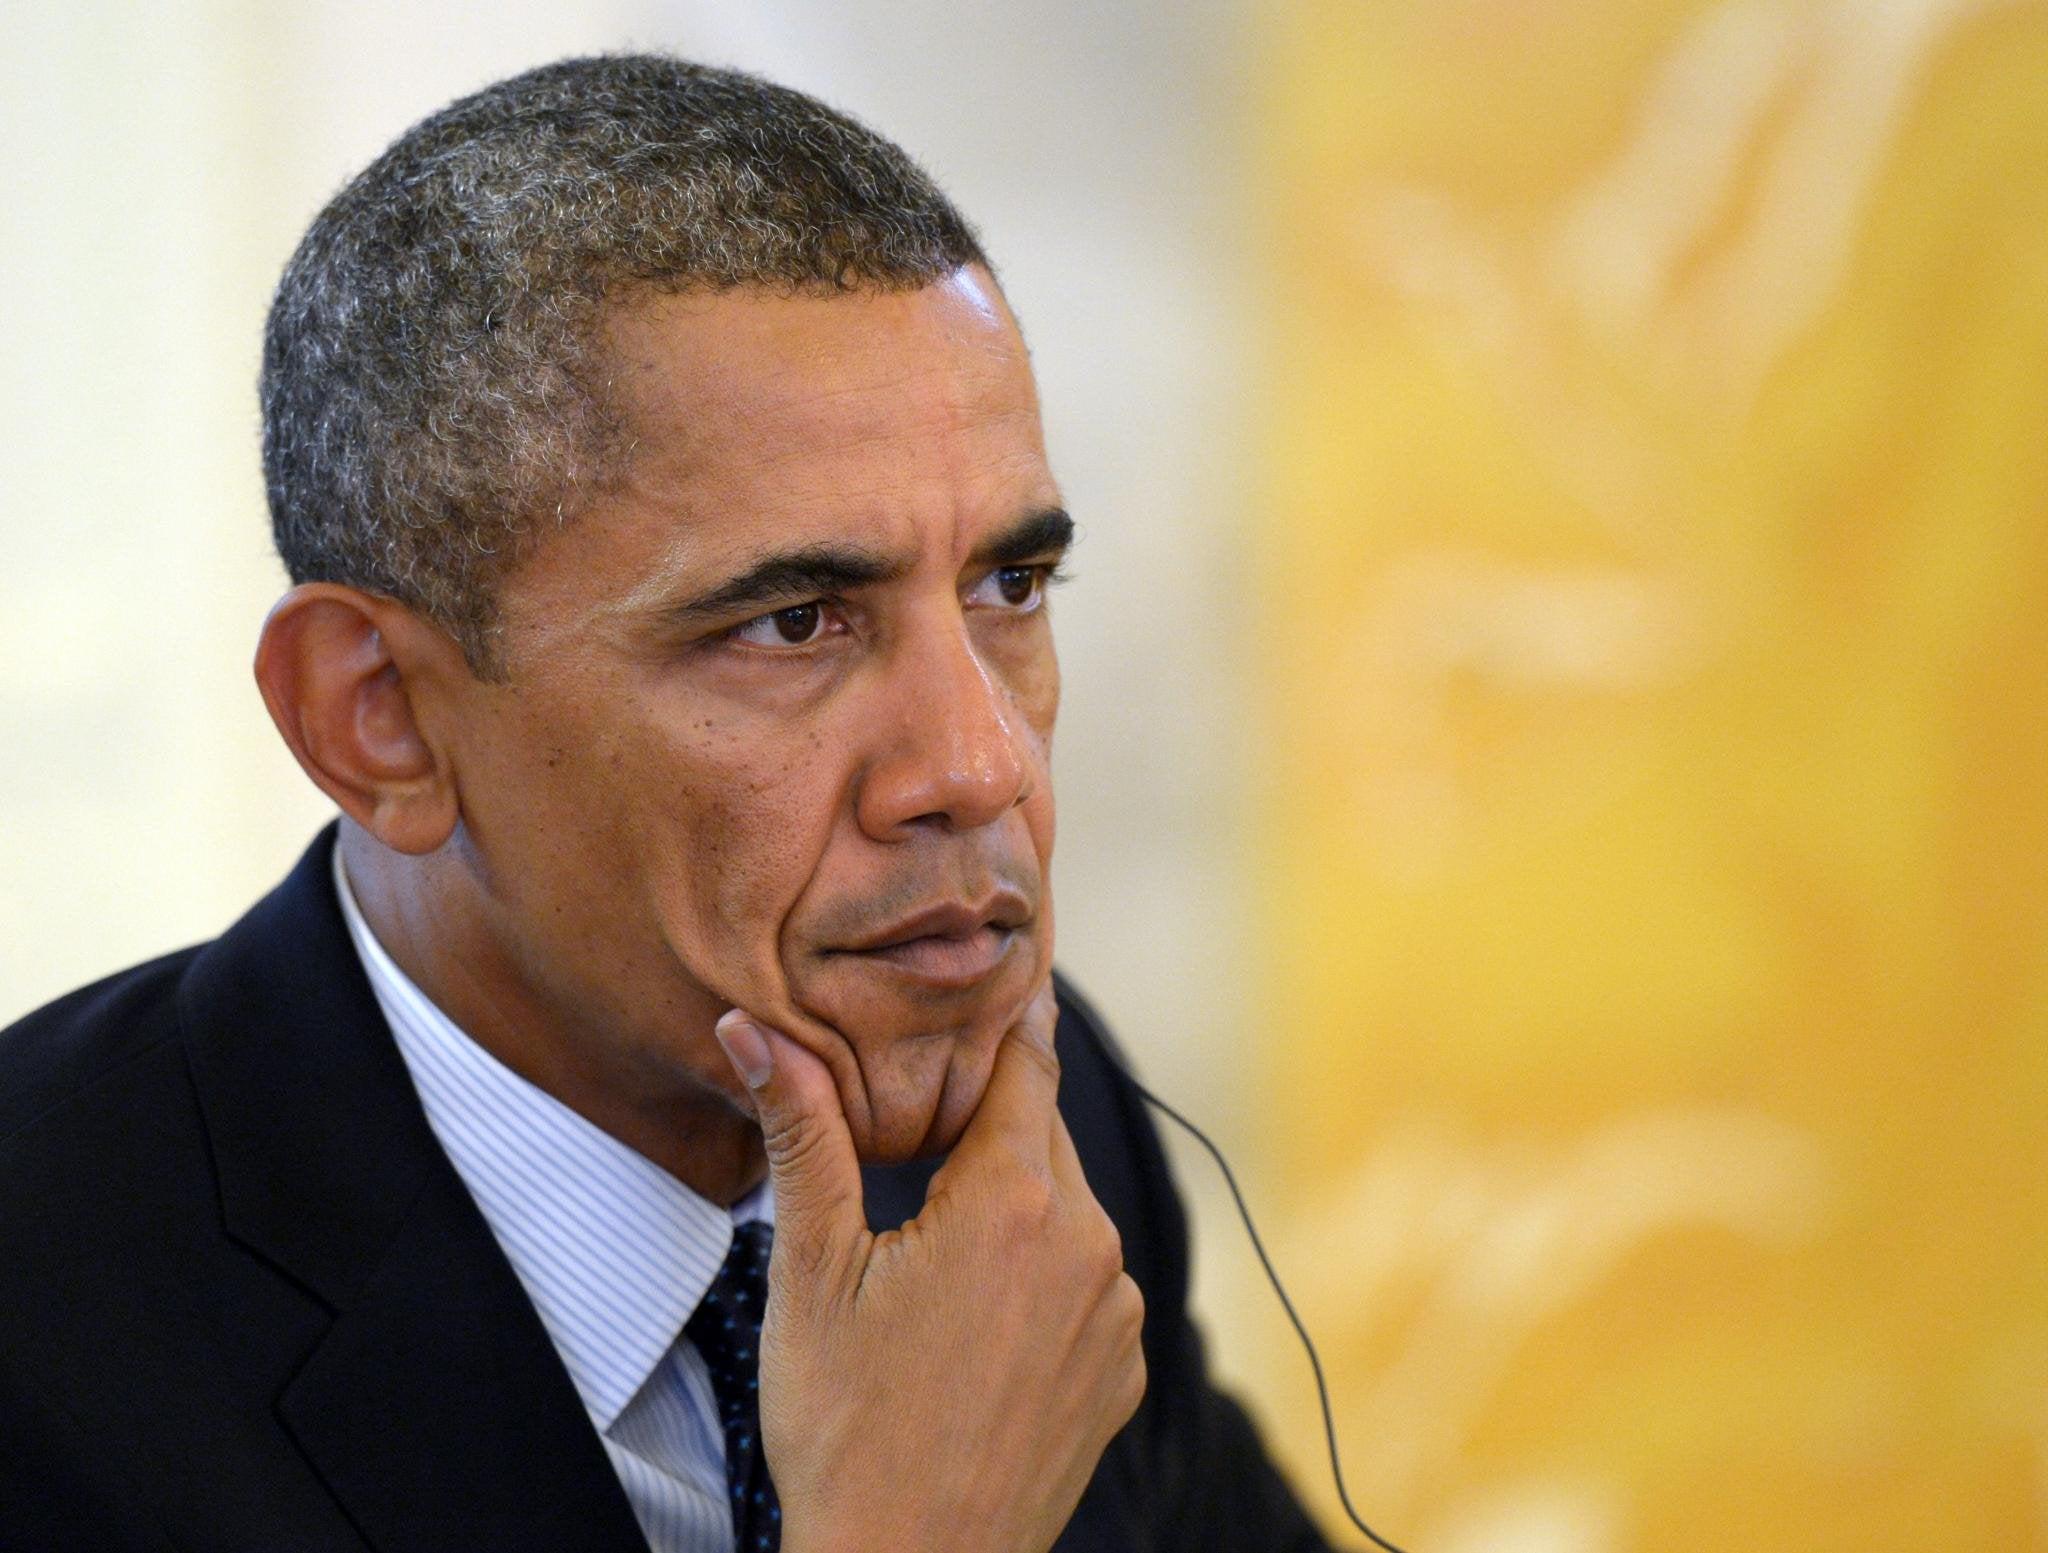 Coffee Talk: President Obama to Address the Nation Tonight on Syria